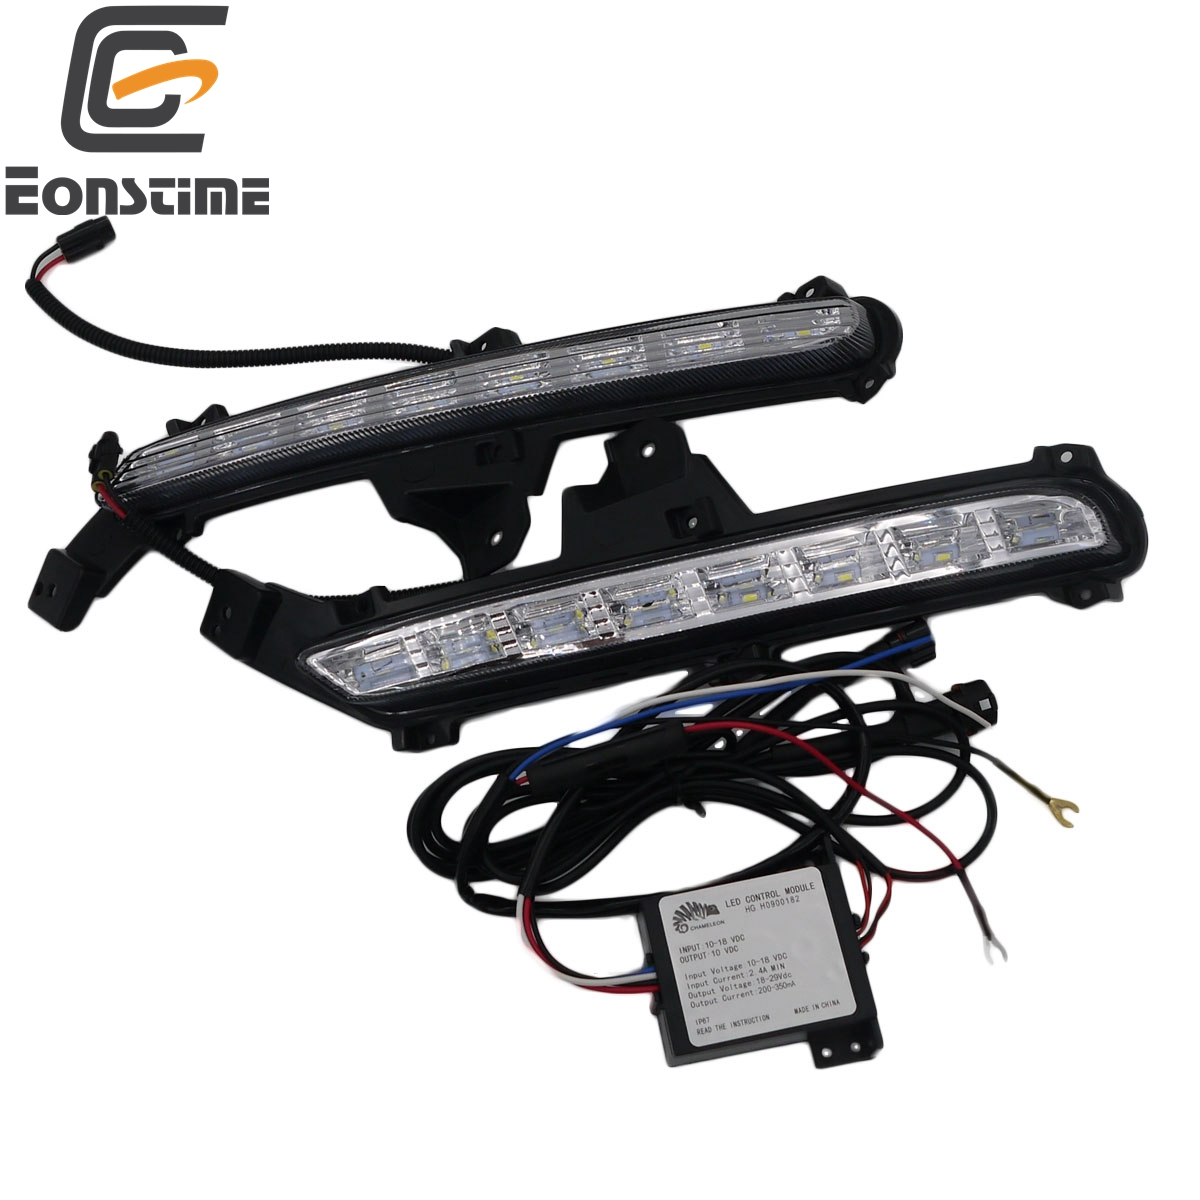 Eonstime 2pcs 12V Car AutoAutomotive Lamp DRL LED Daytime Running Light Fog lights Turn lights For